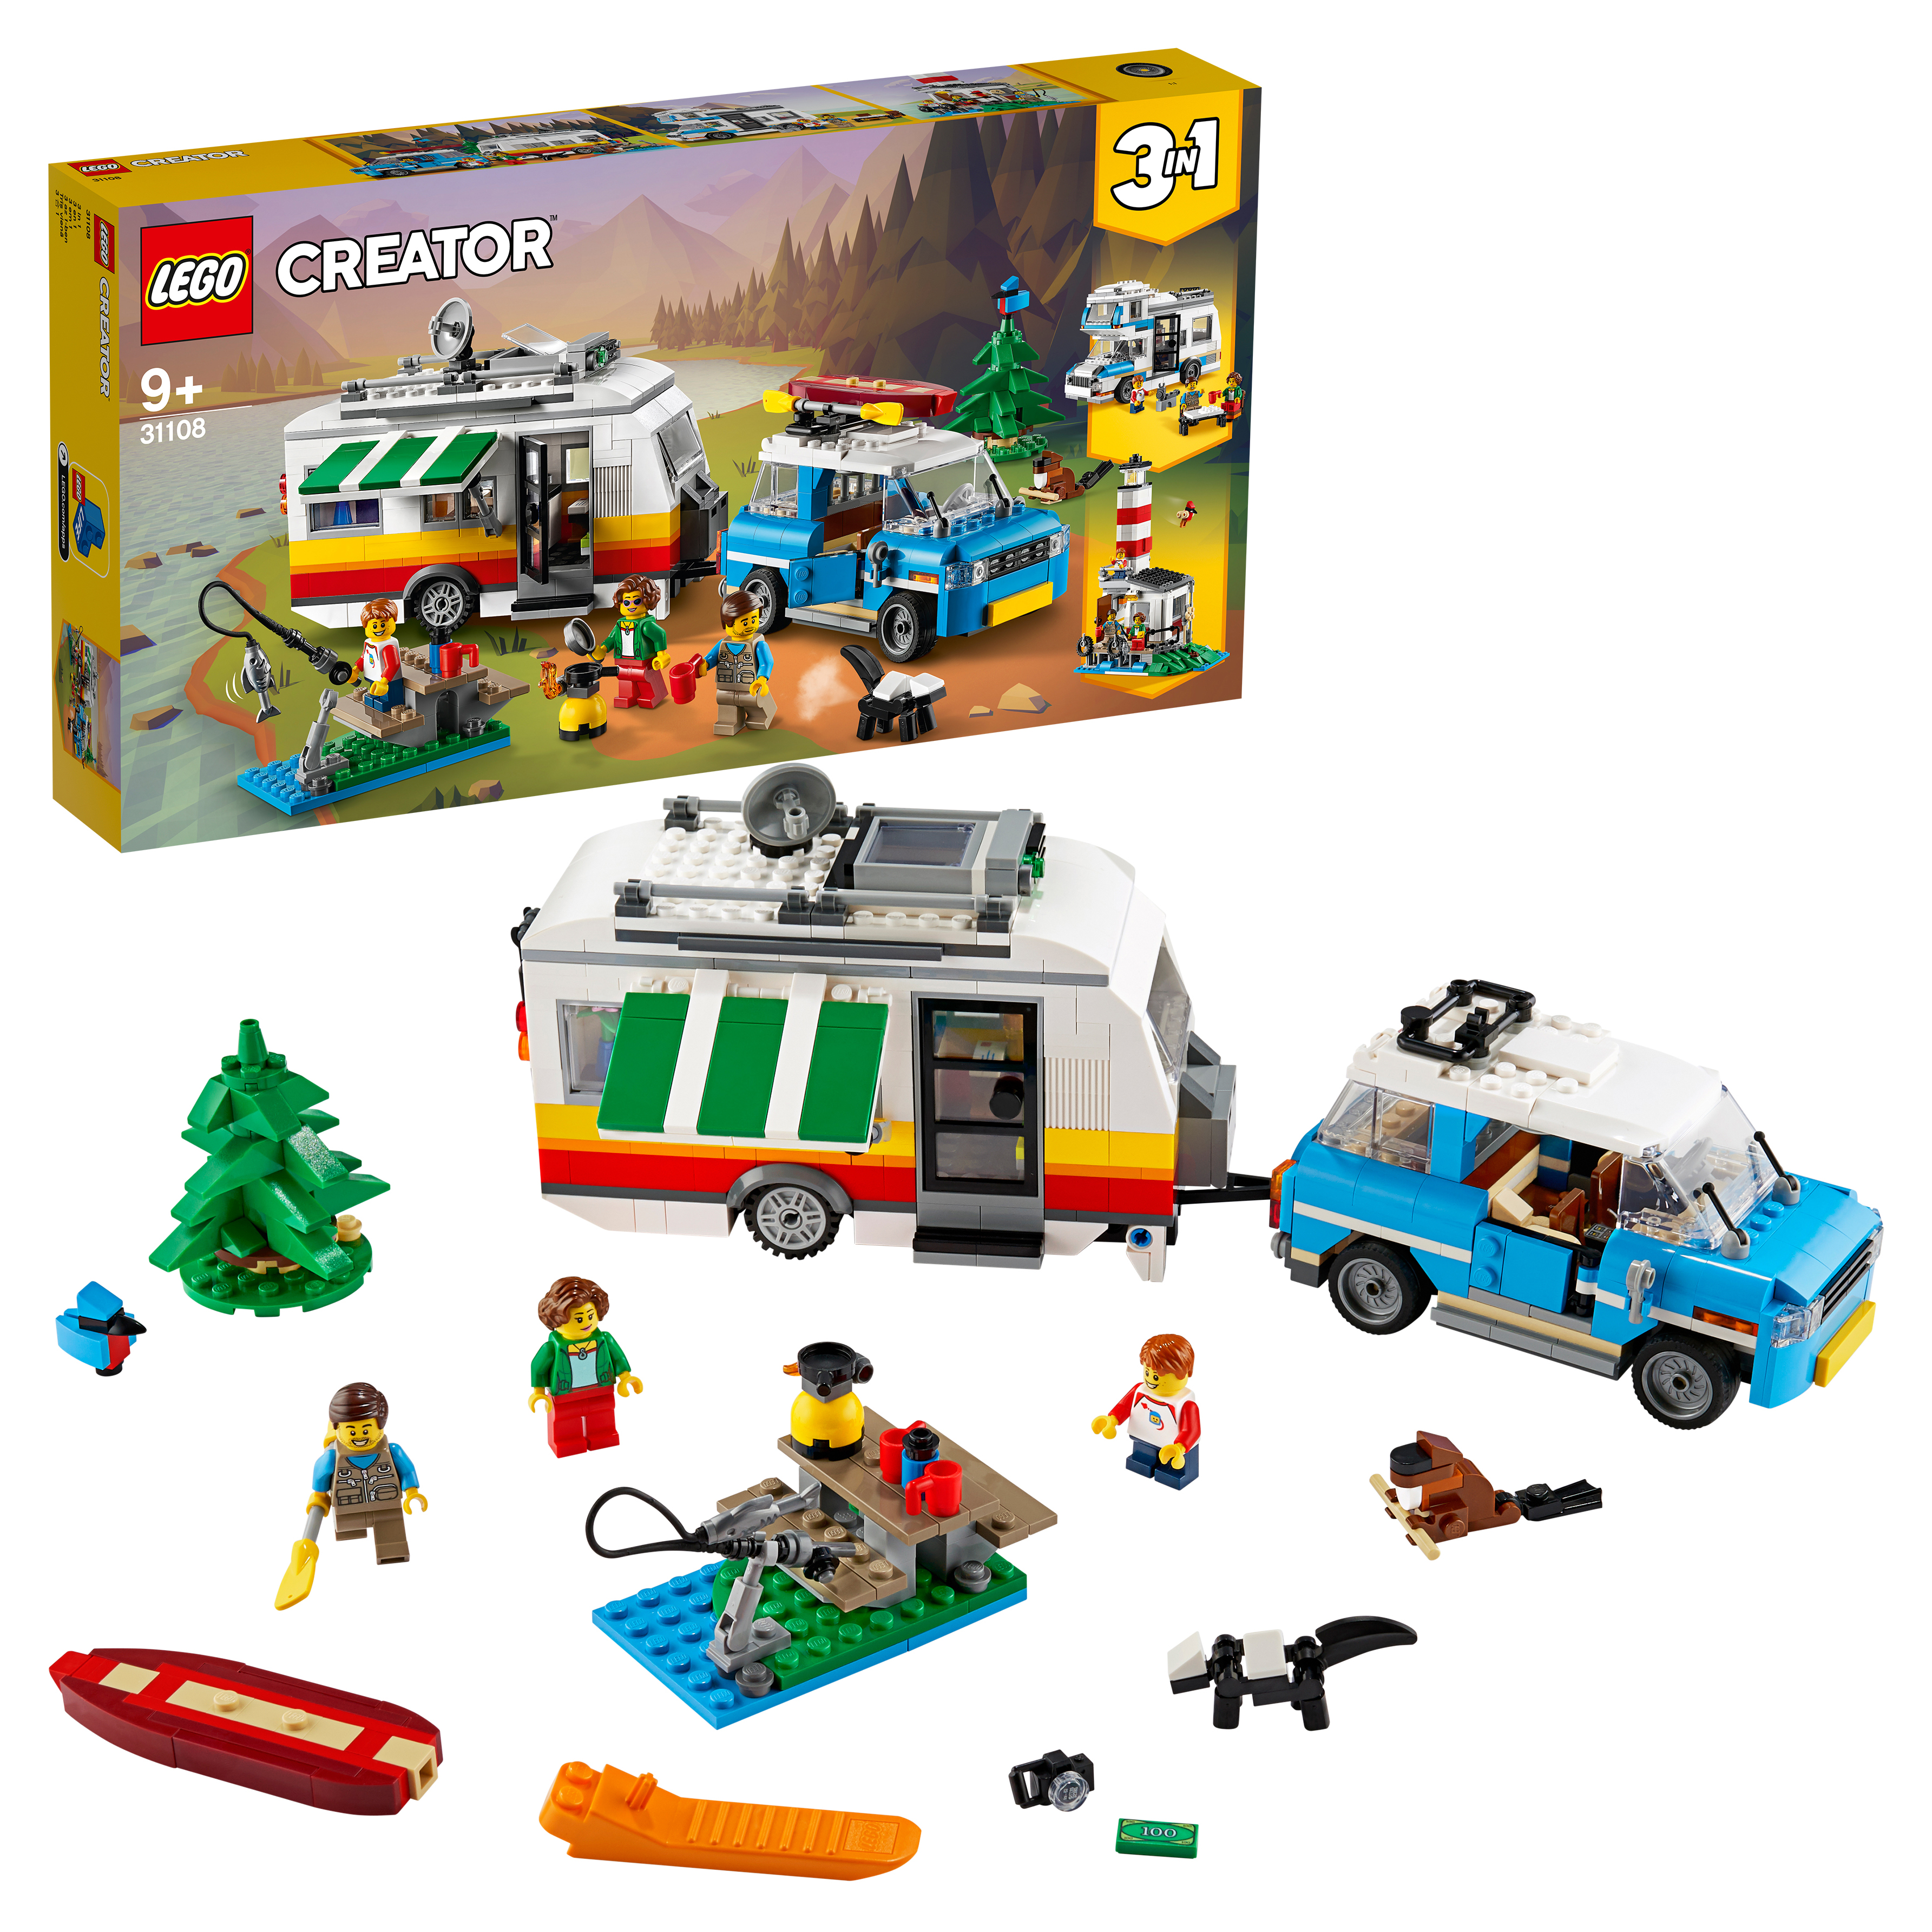 Конструктор LEGO Creator 31108 Отпуск в доме